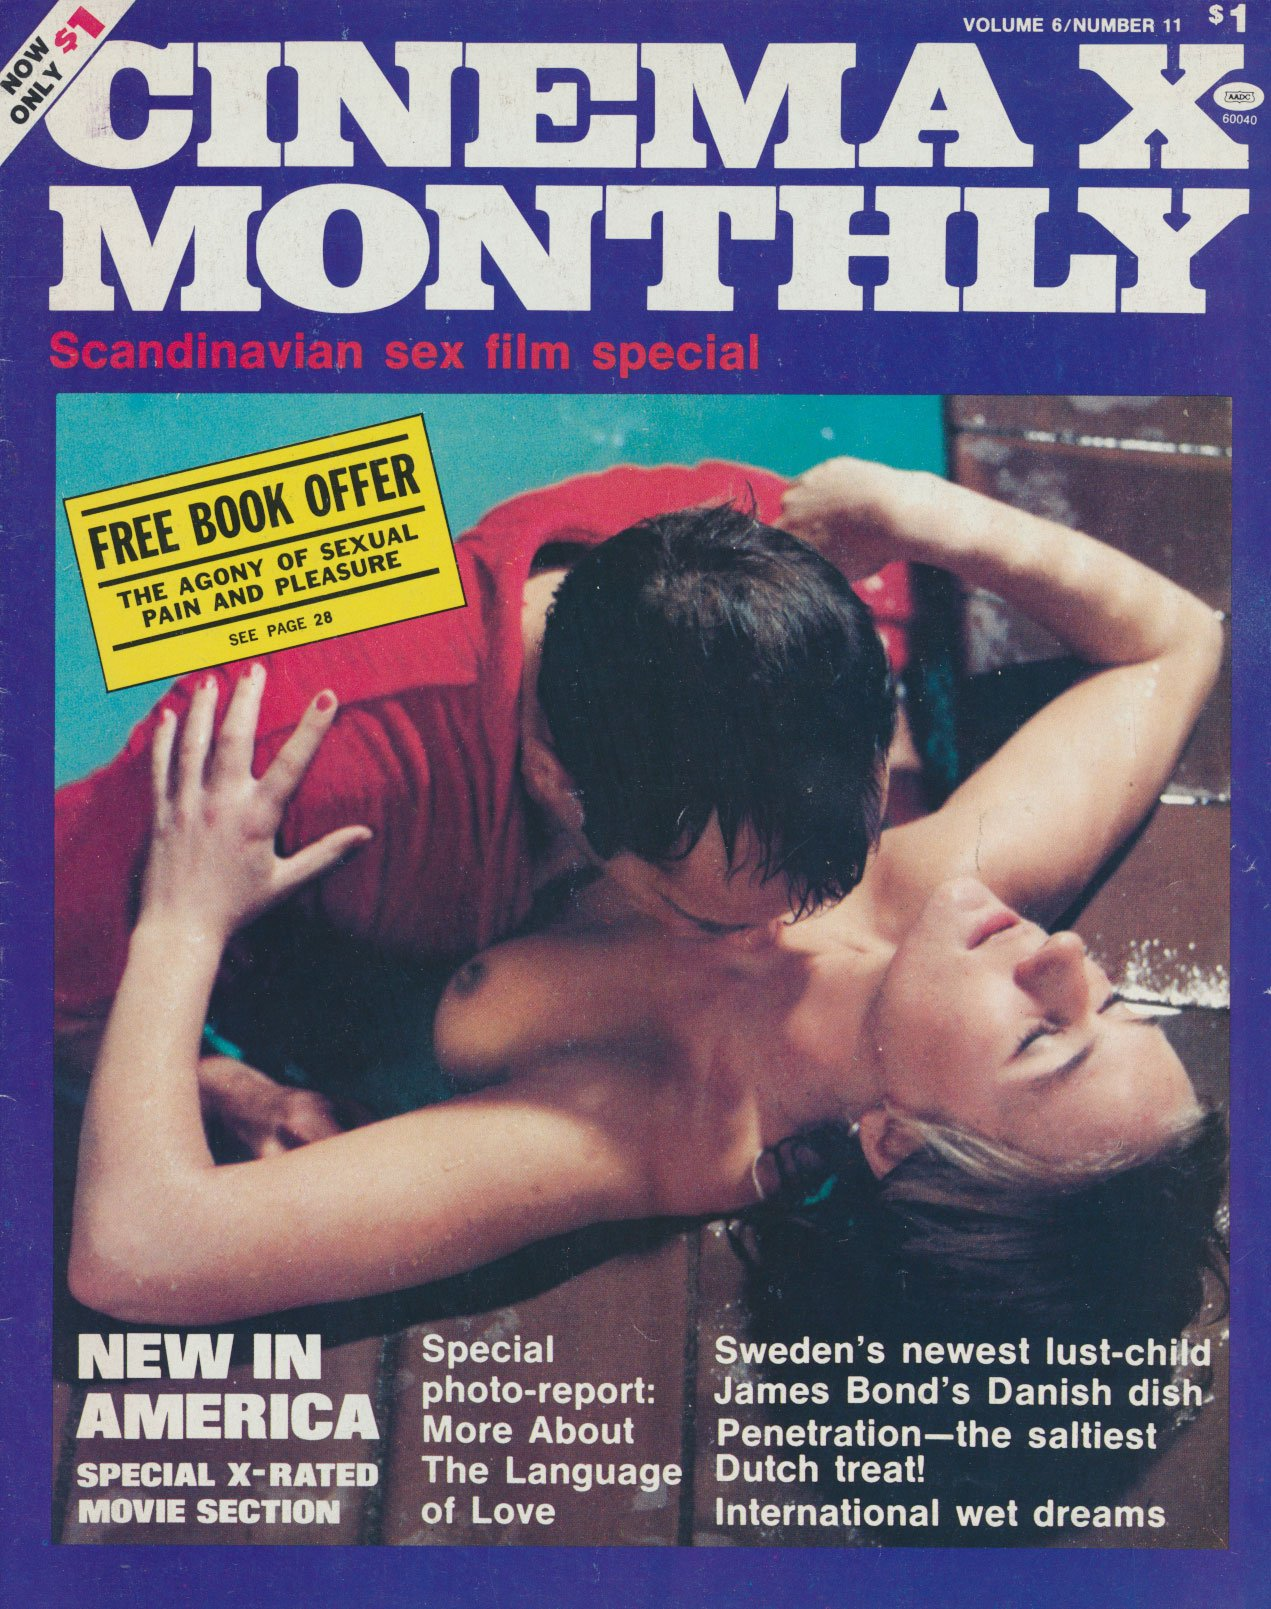 Cinema-X Monthly Vol. 6 # 11 magazine back issue Cinema-X Monthly magizine back copy